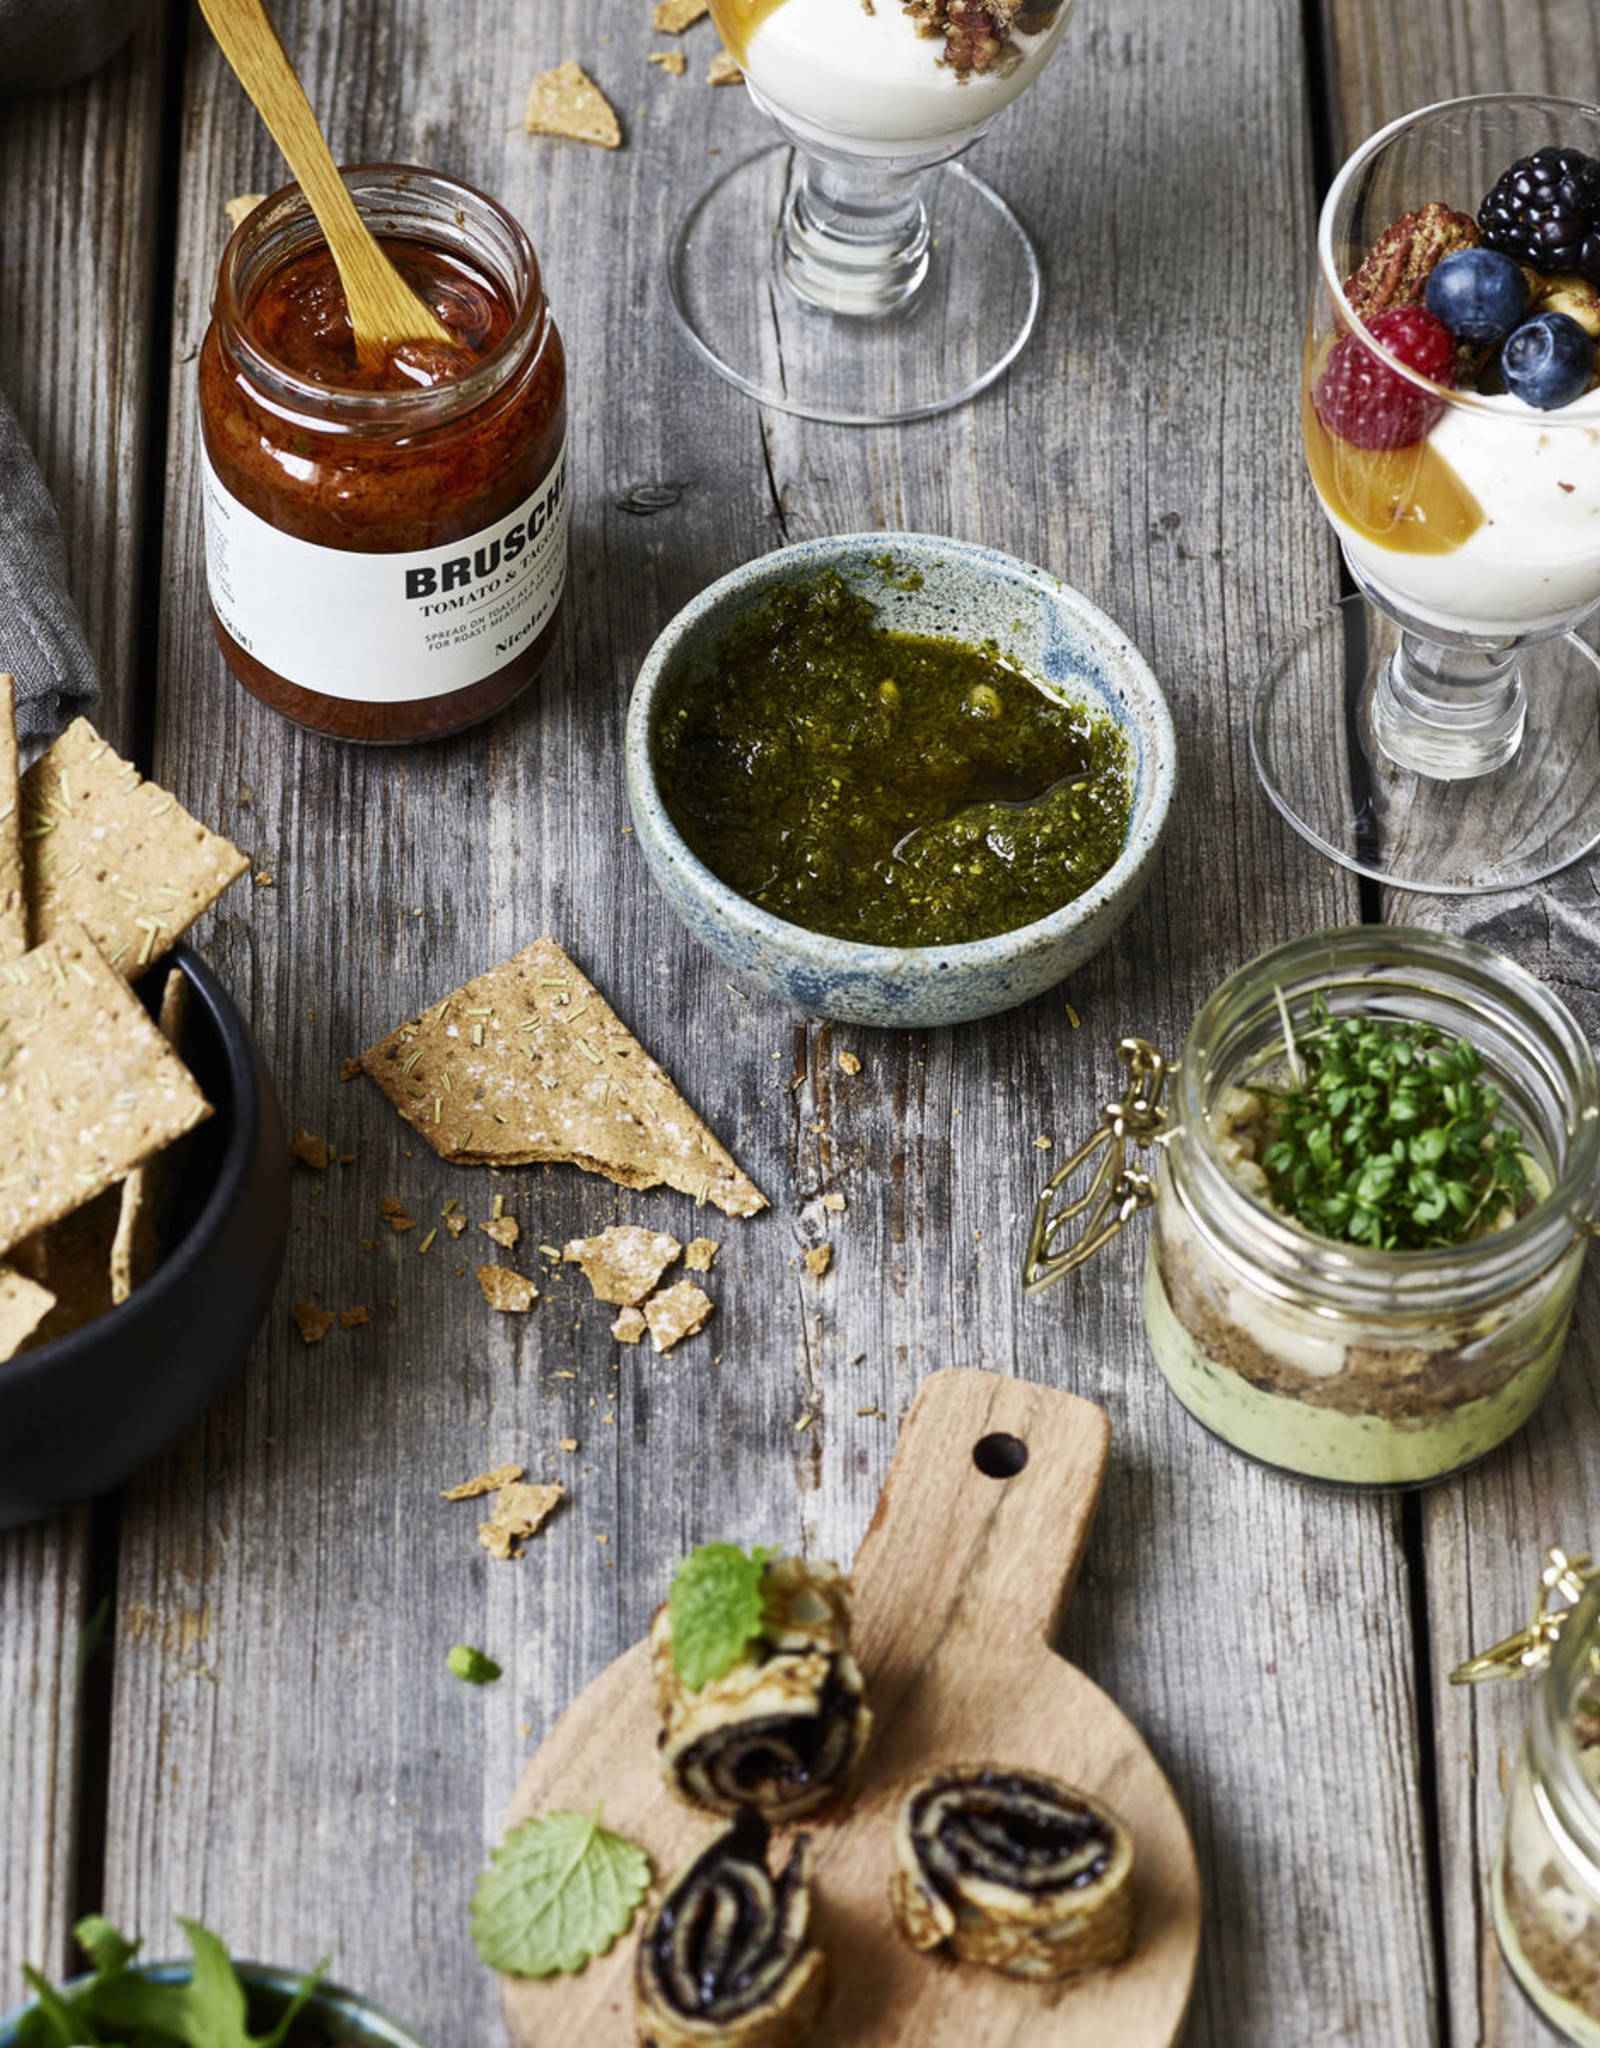 Nicolas Vahé Bruschetta Dip-tomato & taggiasca olive